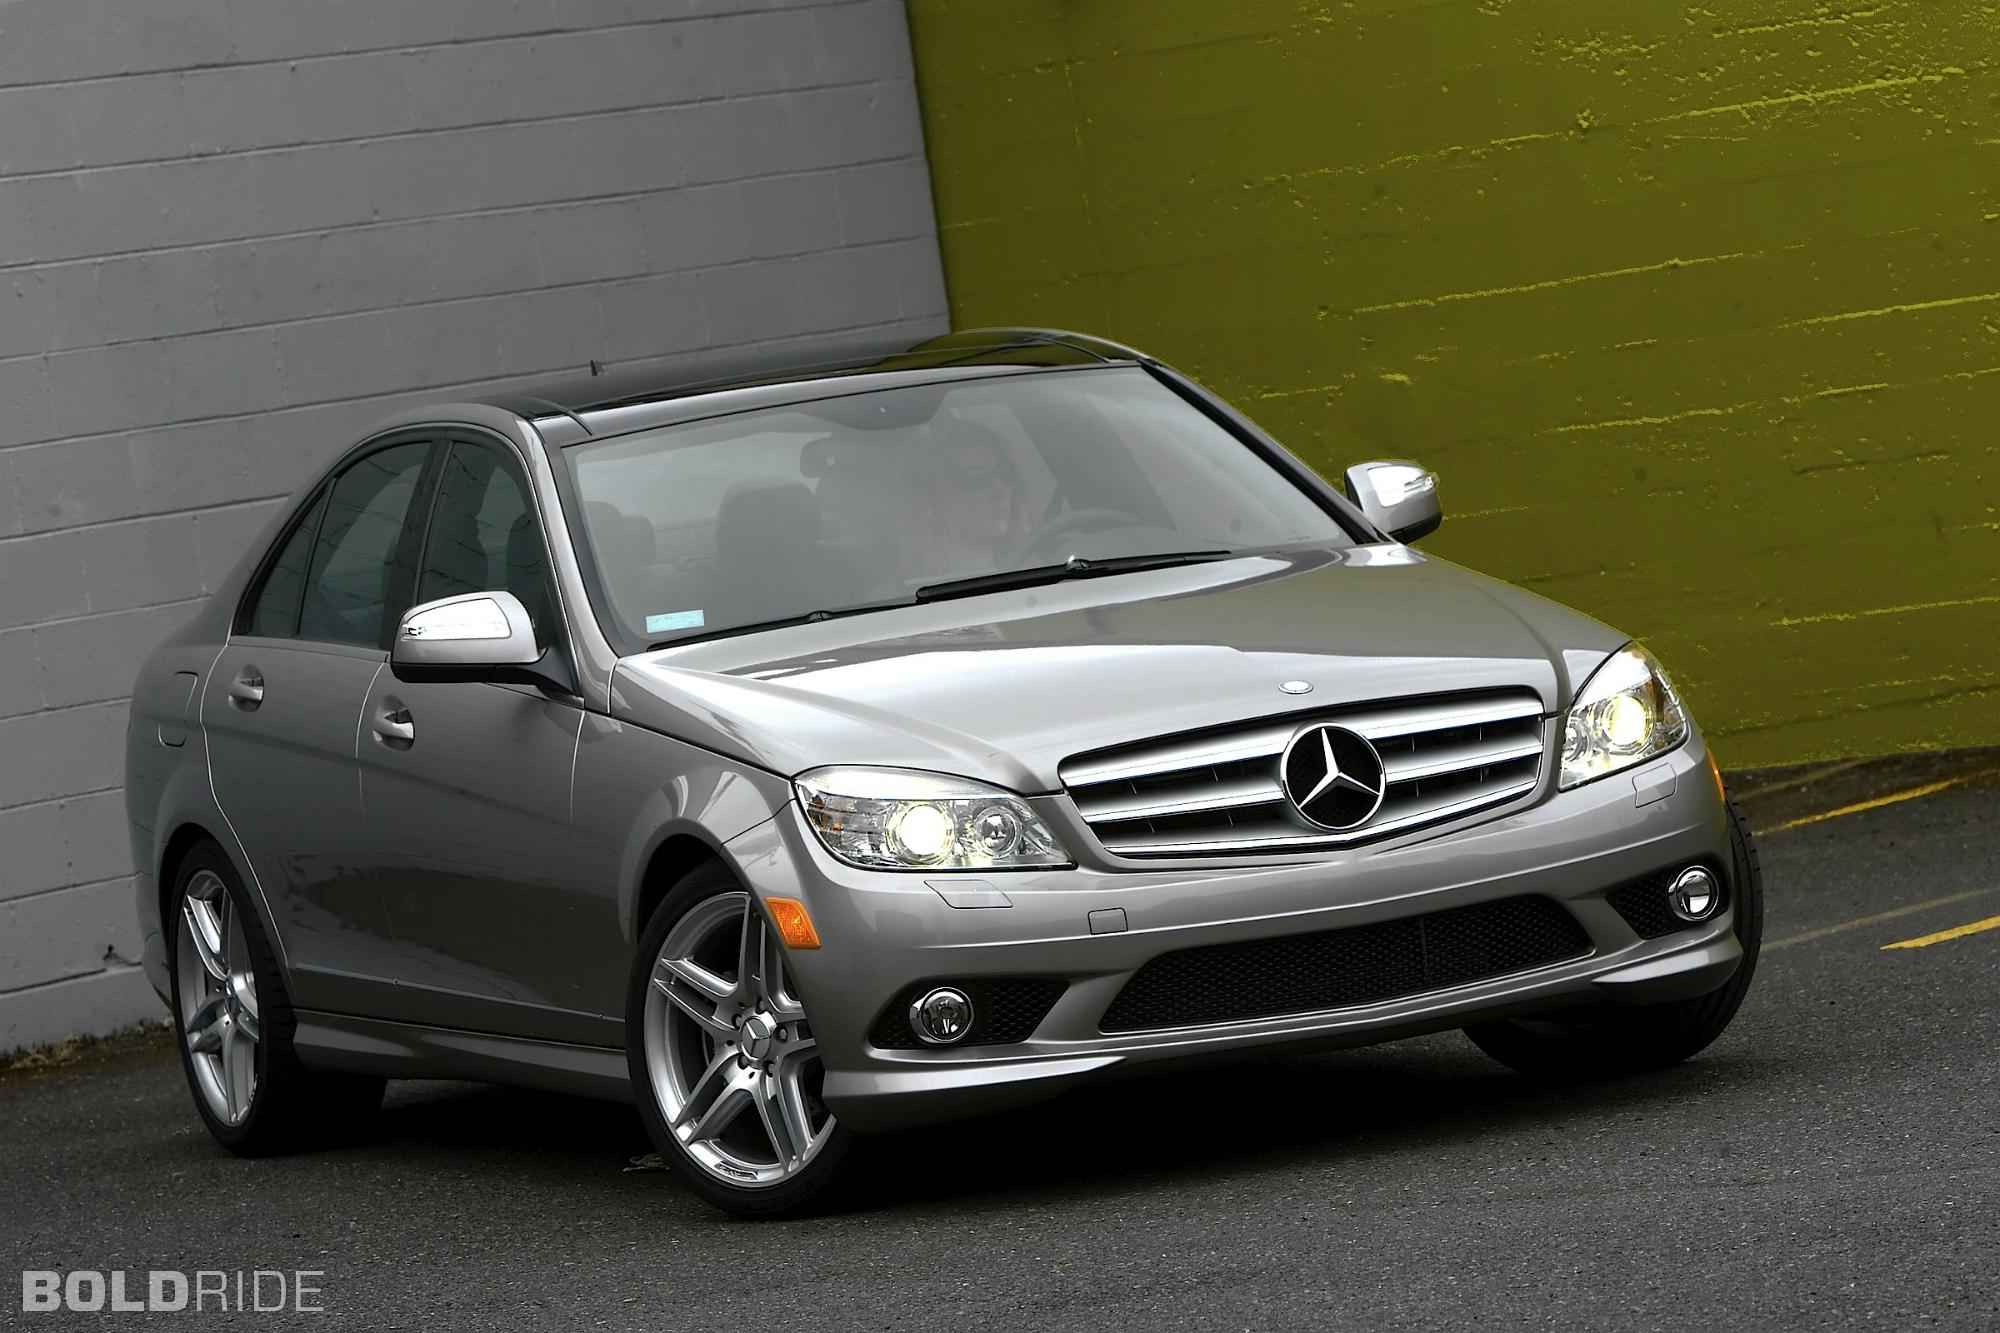 2000 mercedes benz c class image 10 for Mercedes benz 2000 models